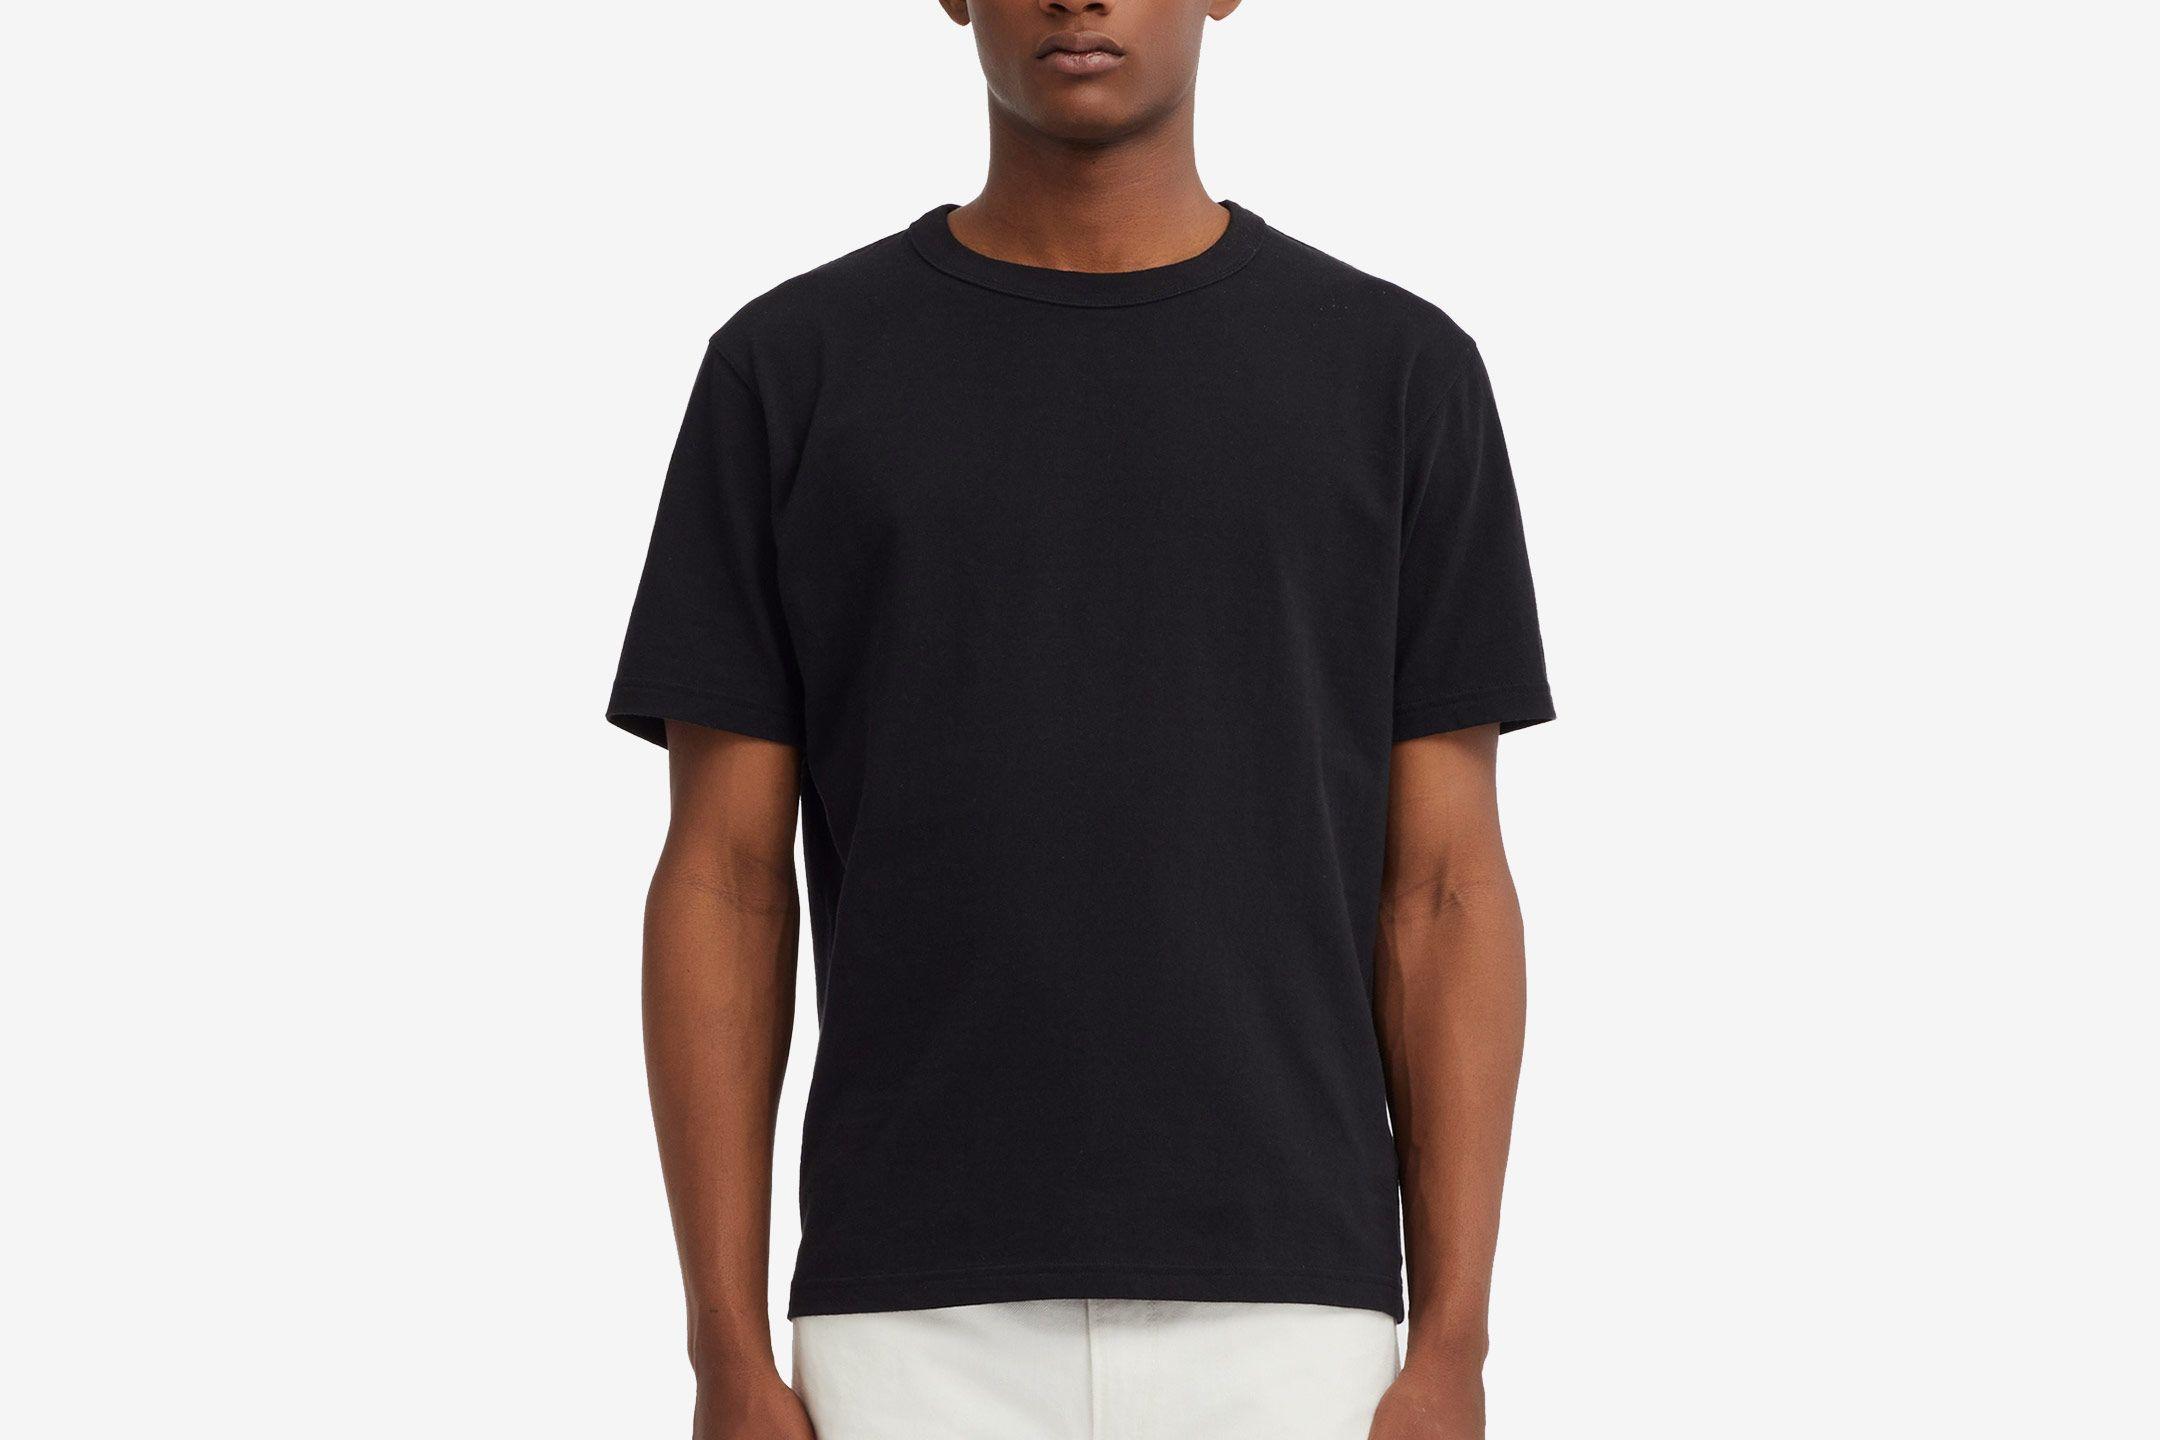 41ca7136 Uniqlo U Crewneck Short Sleeve T-shirt at Uniqlo